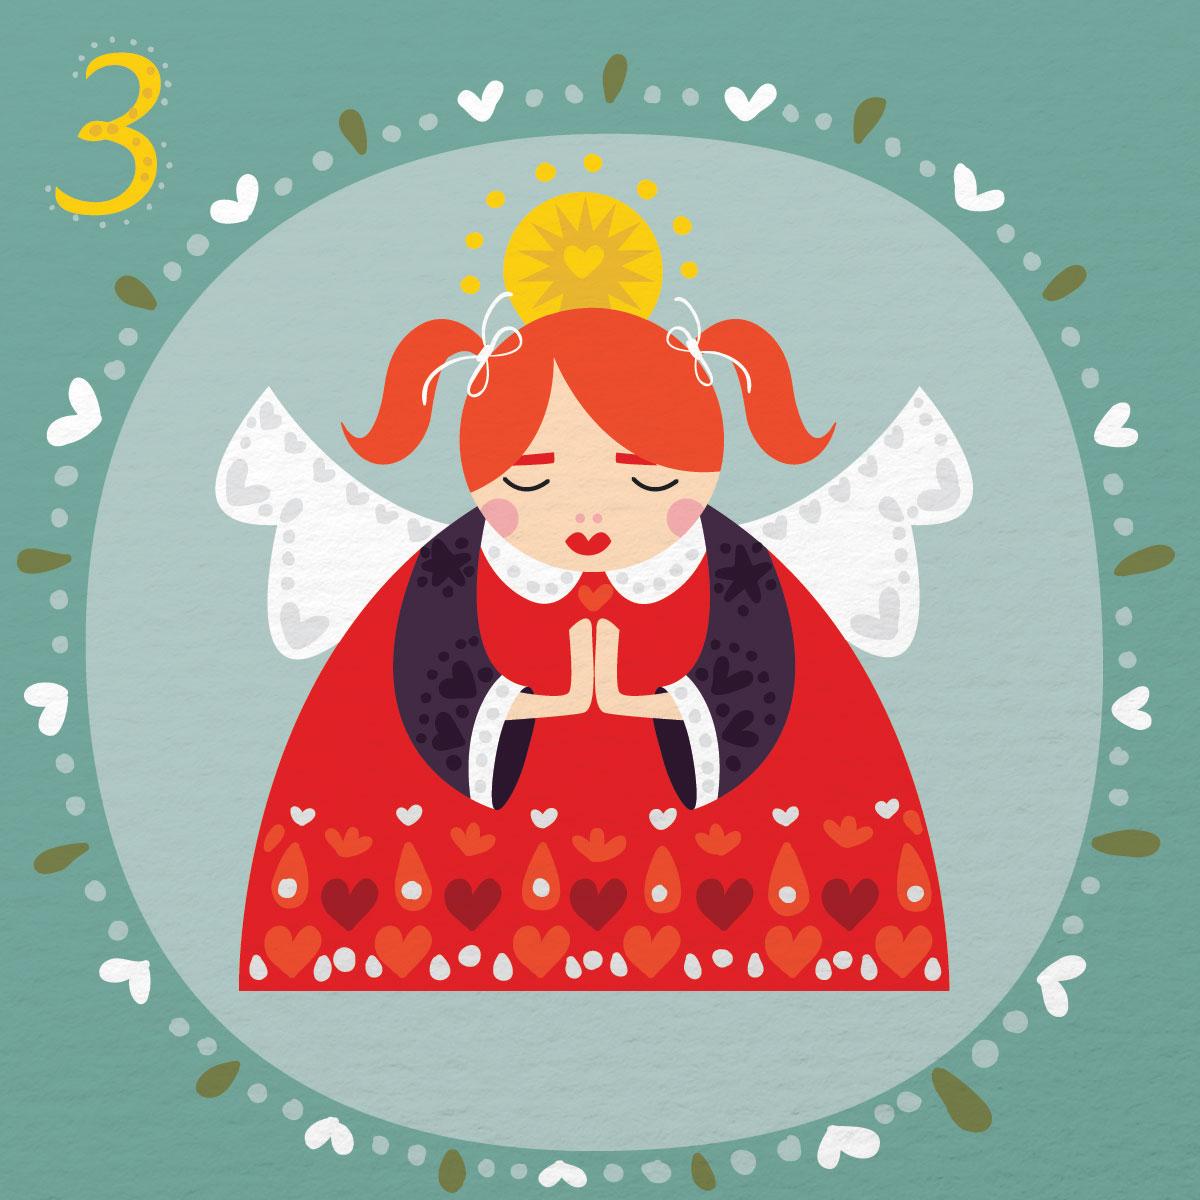 Illustrated advent calendar: Day 3